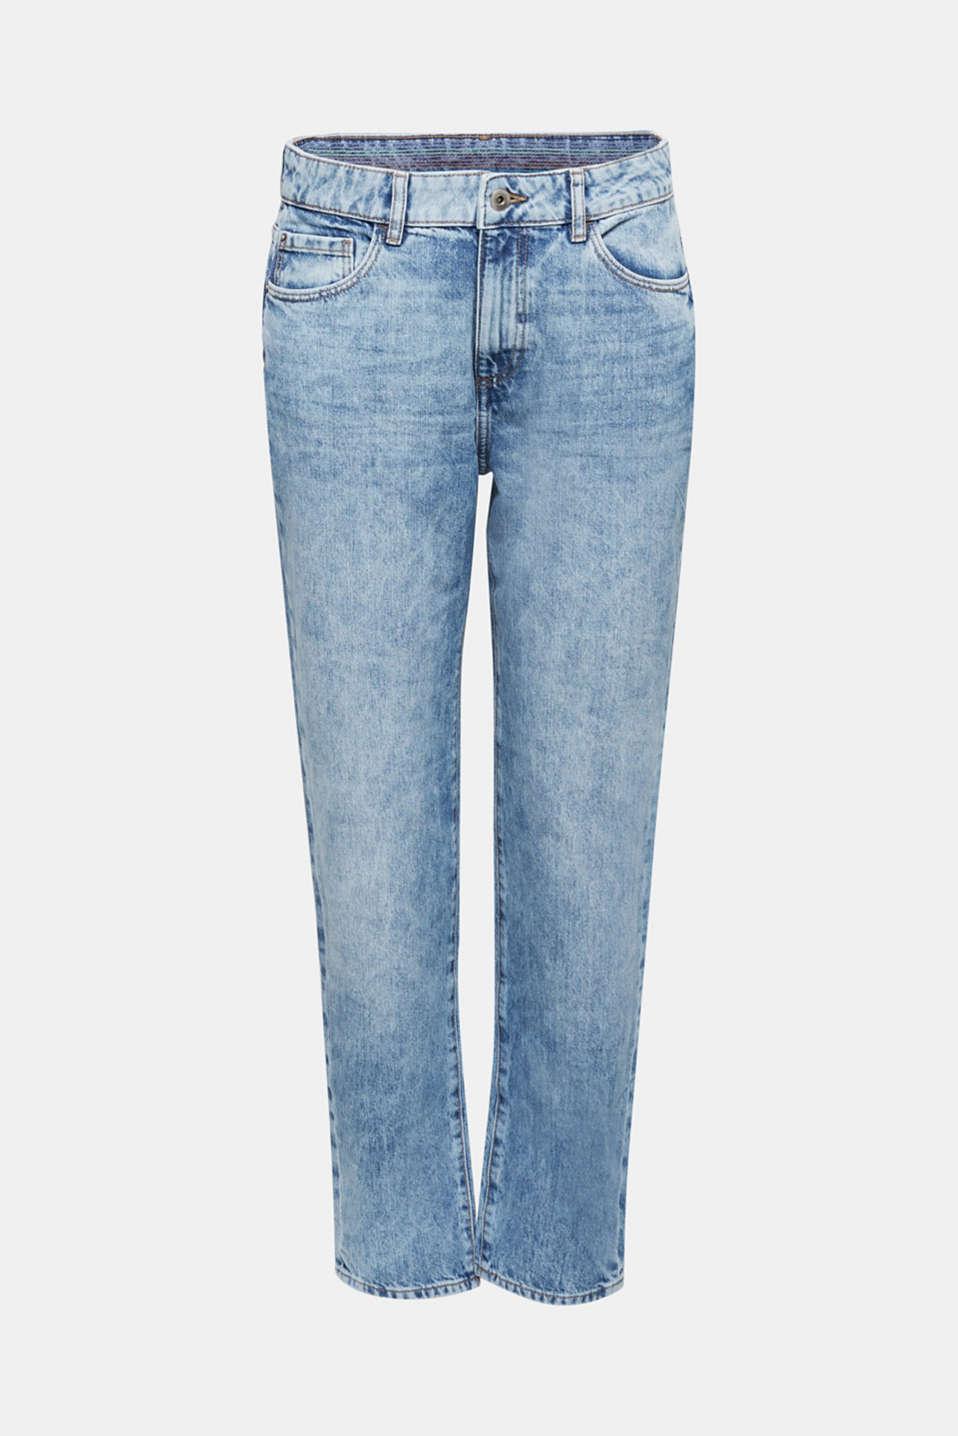 Pants denim, BLUE BLEACHED, detail image number 7